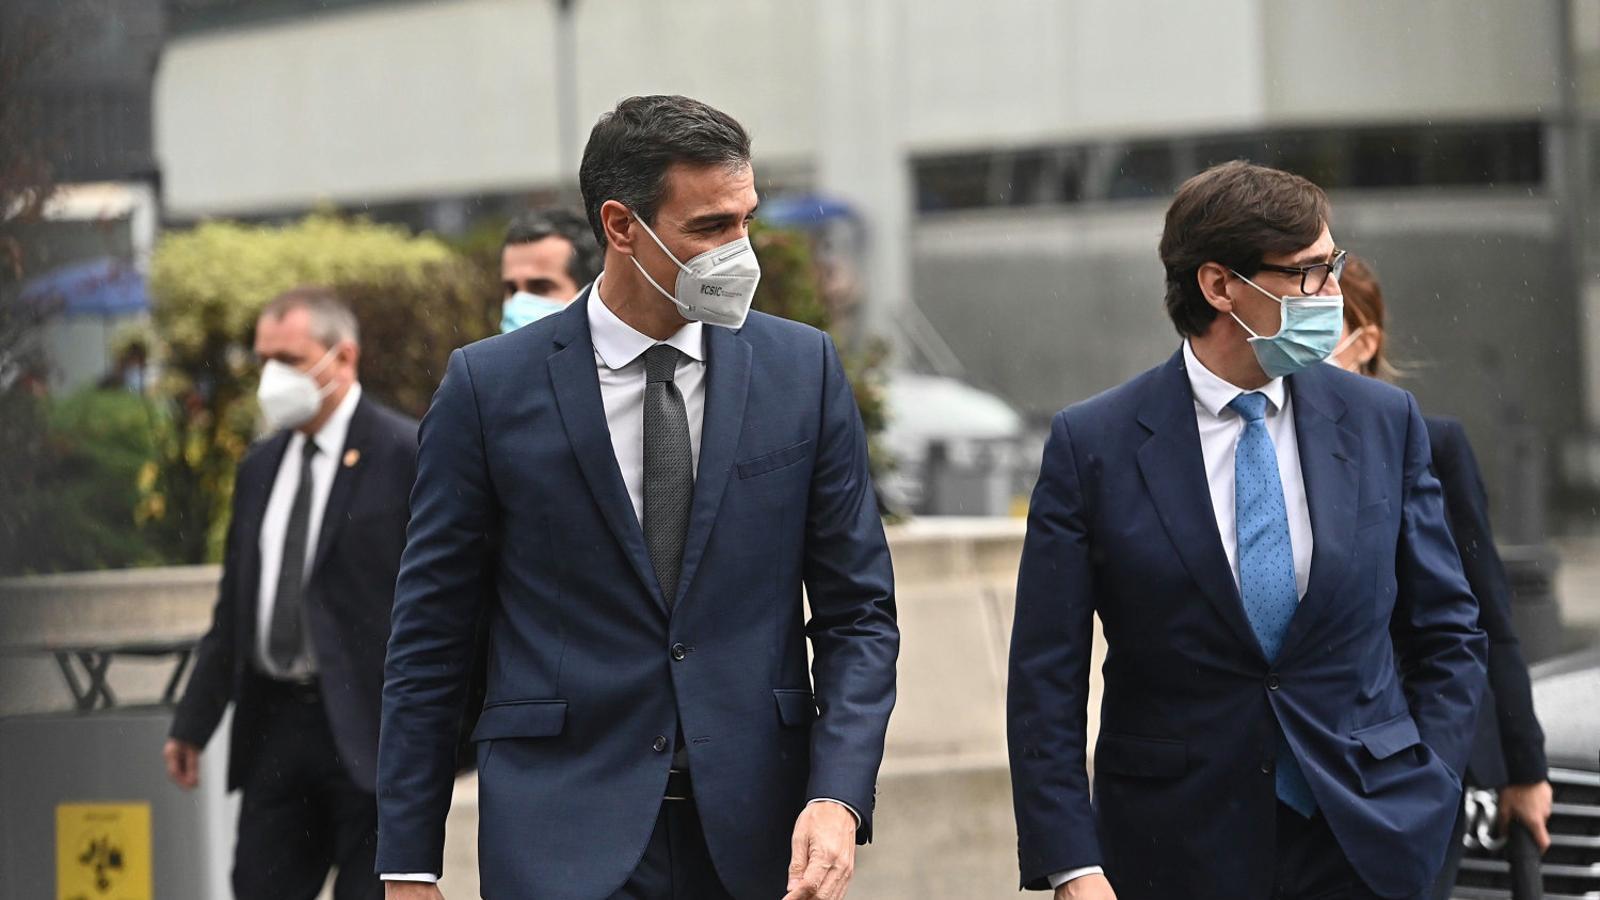 Sánchez encarrila la legislatura de la mano del bloque de investidura